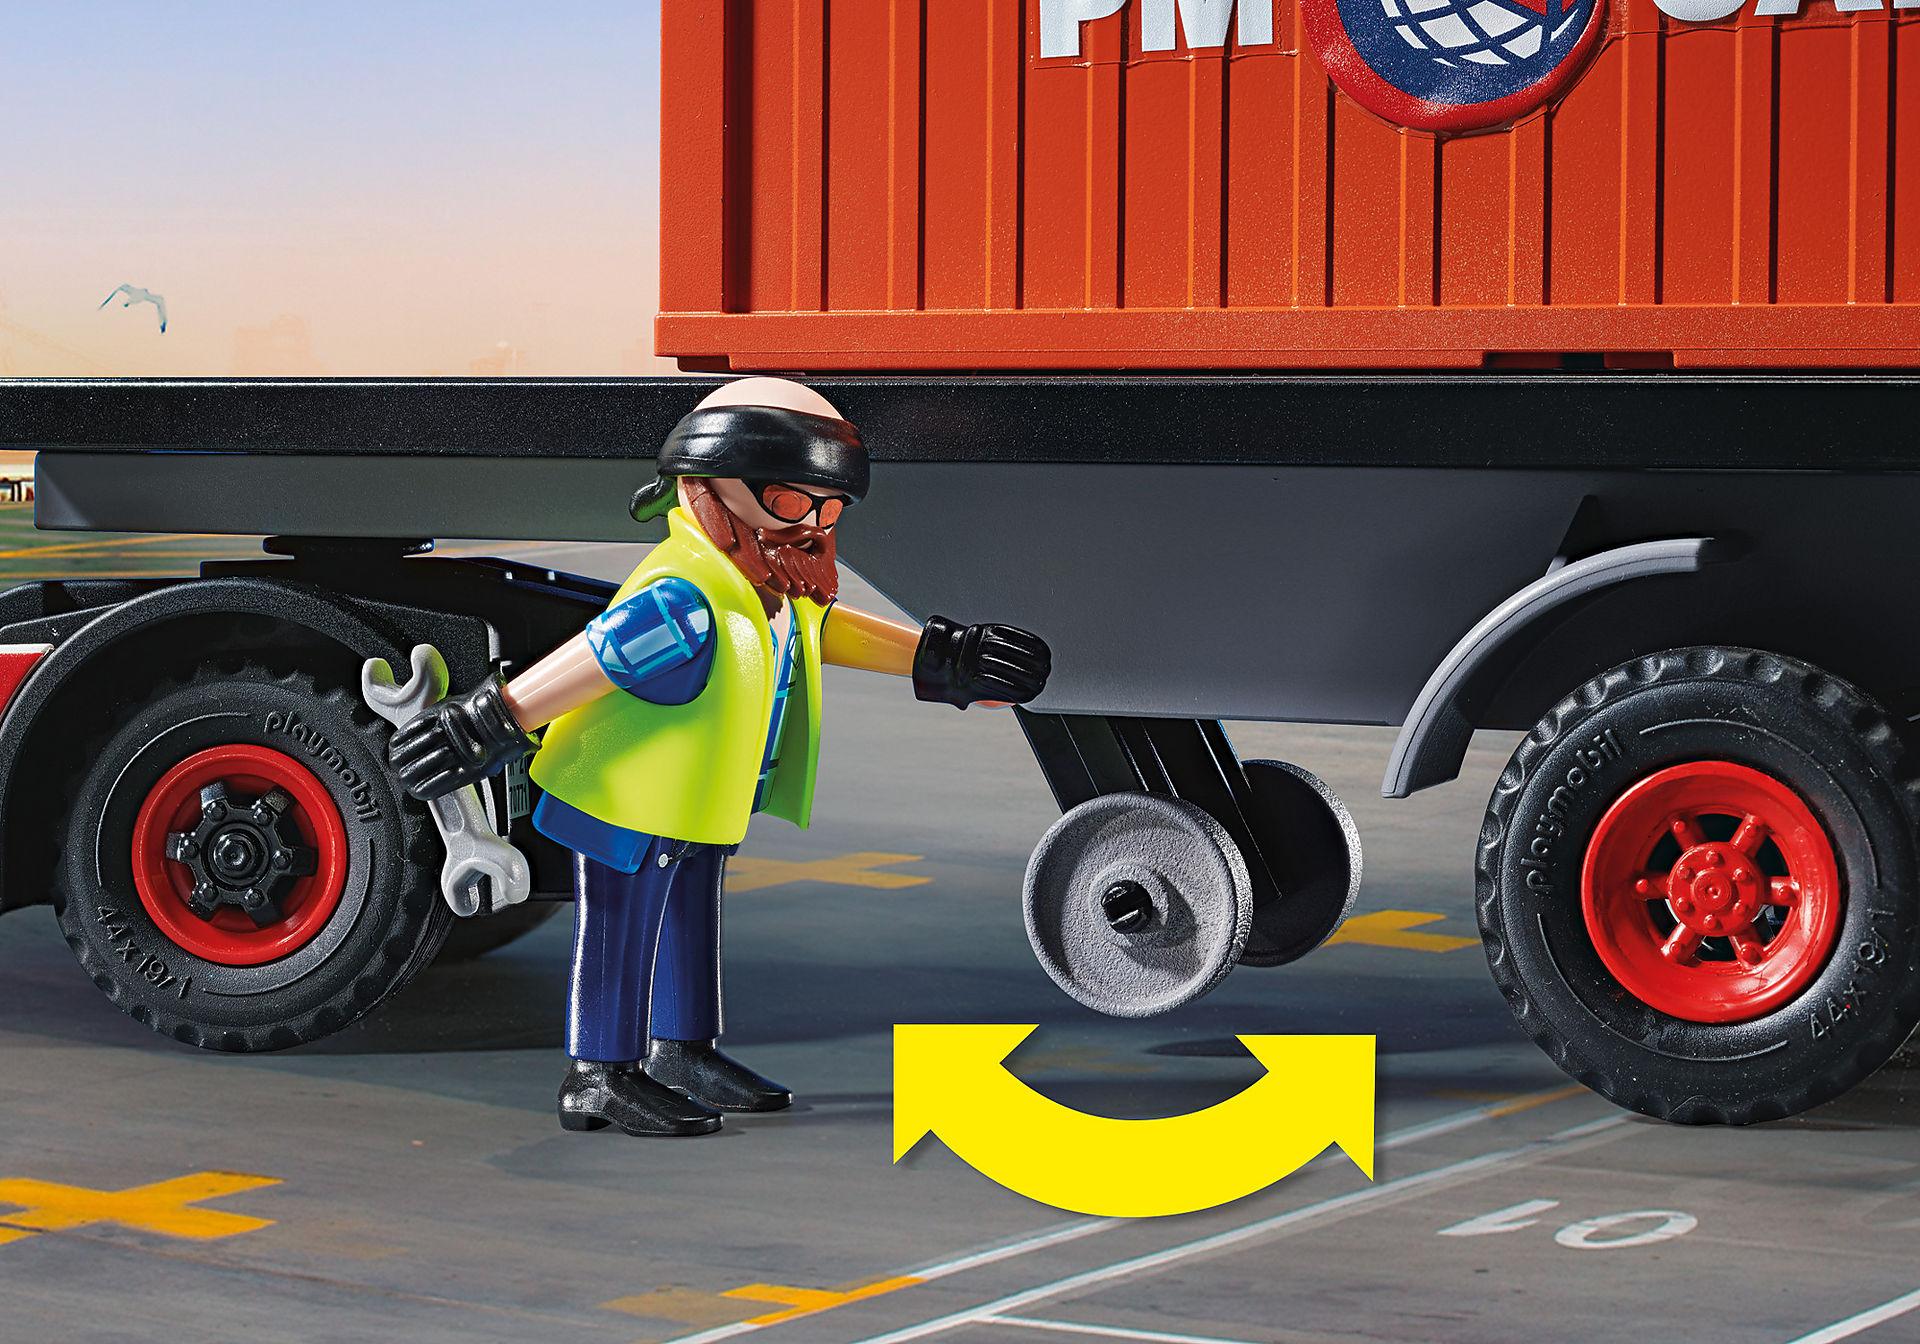 70771 Lastbil med lastcontainer zoom image5